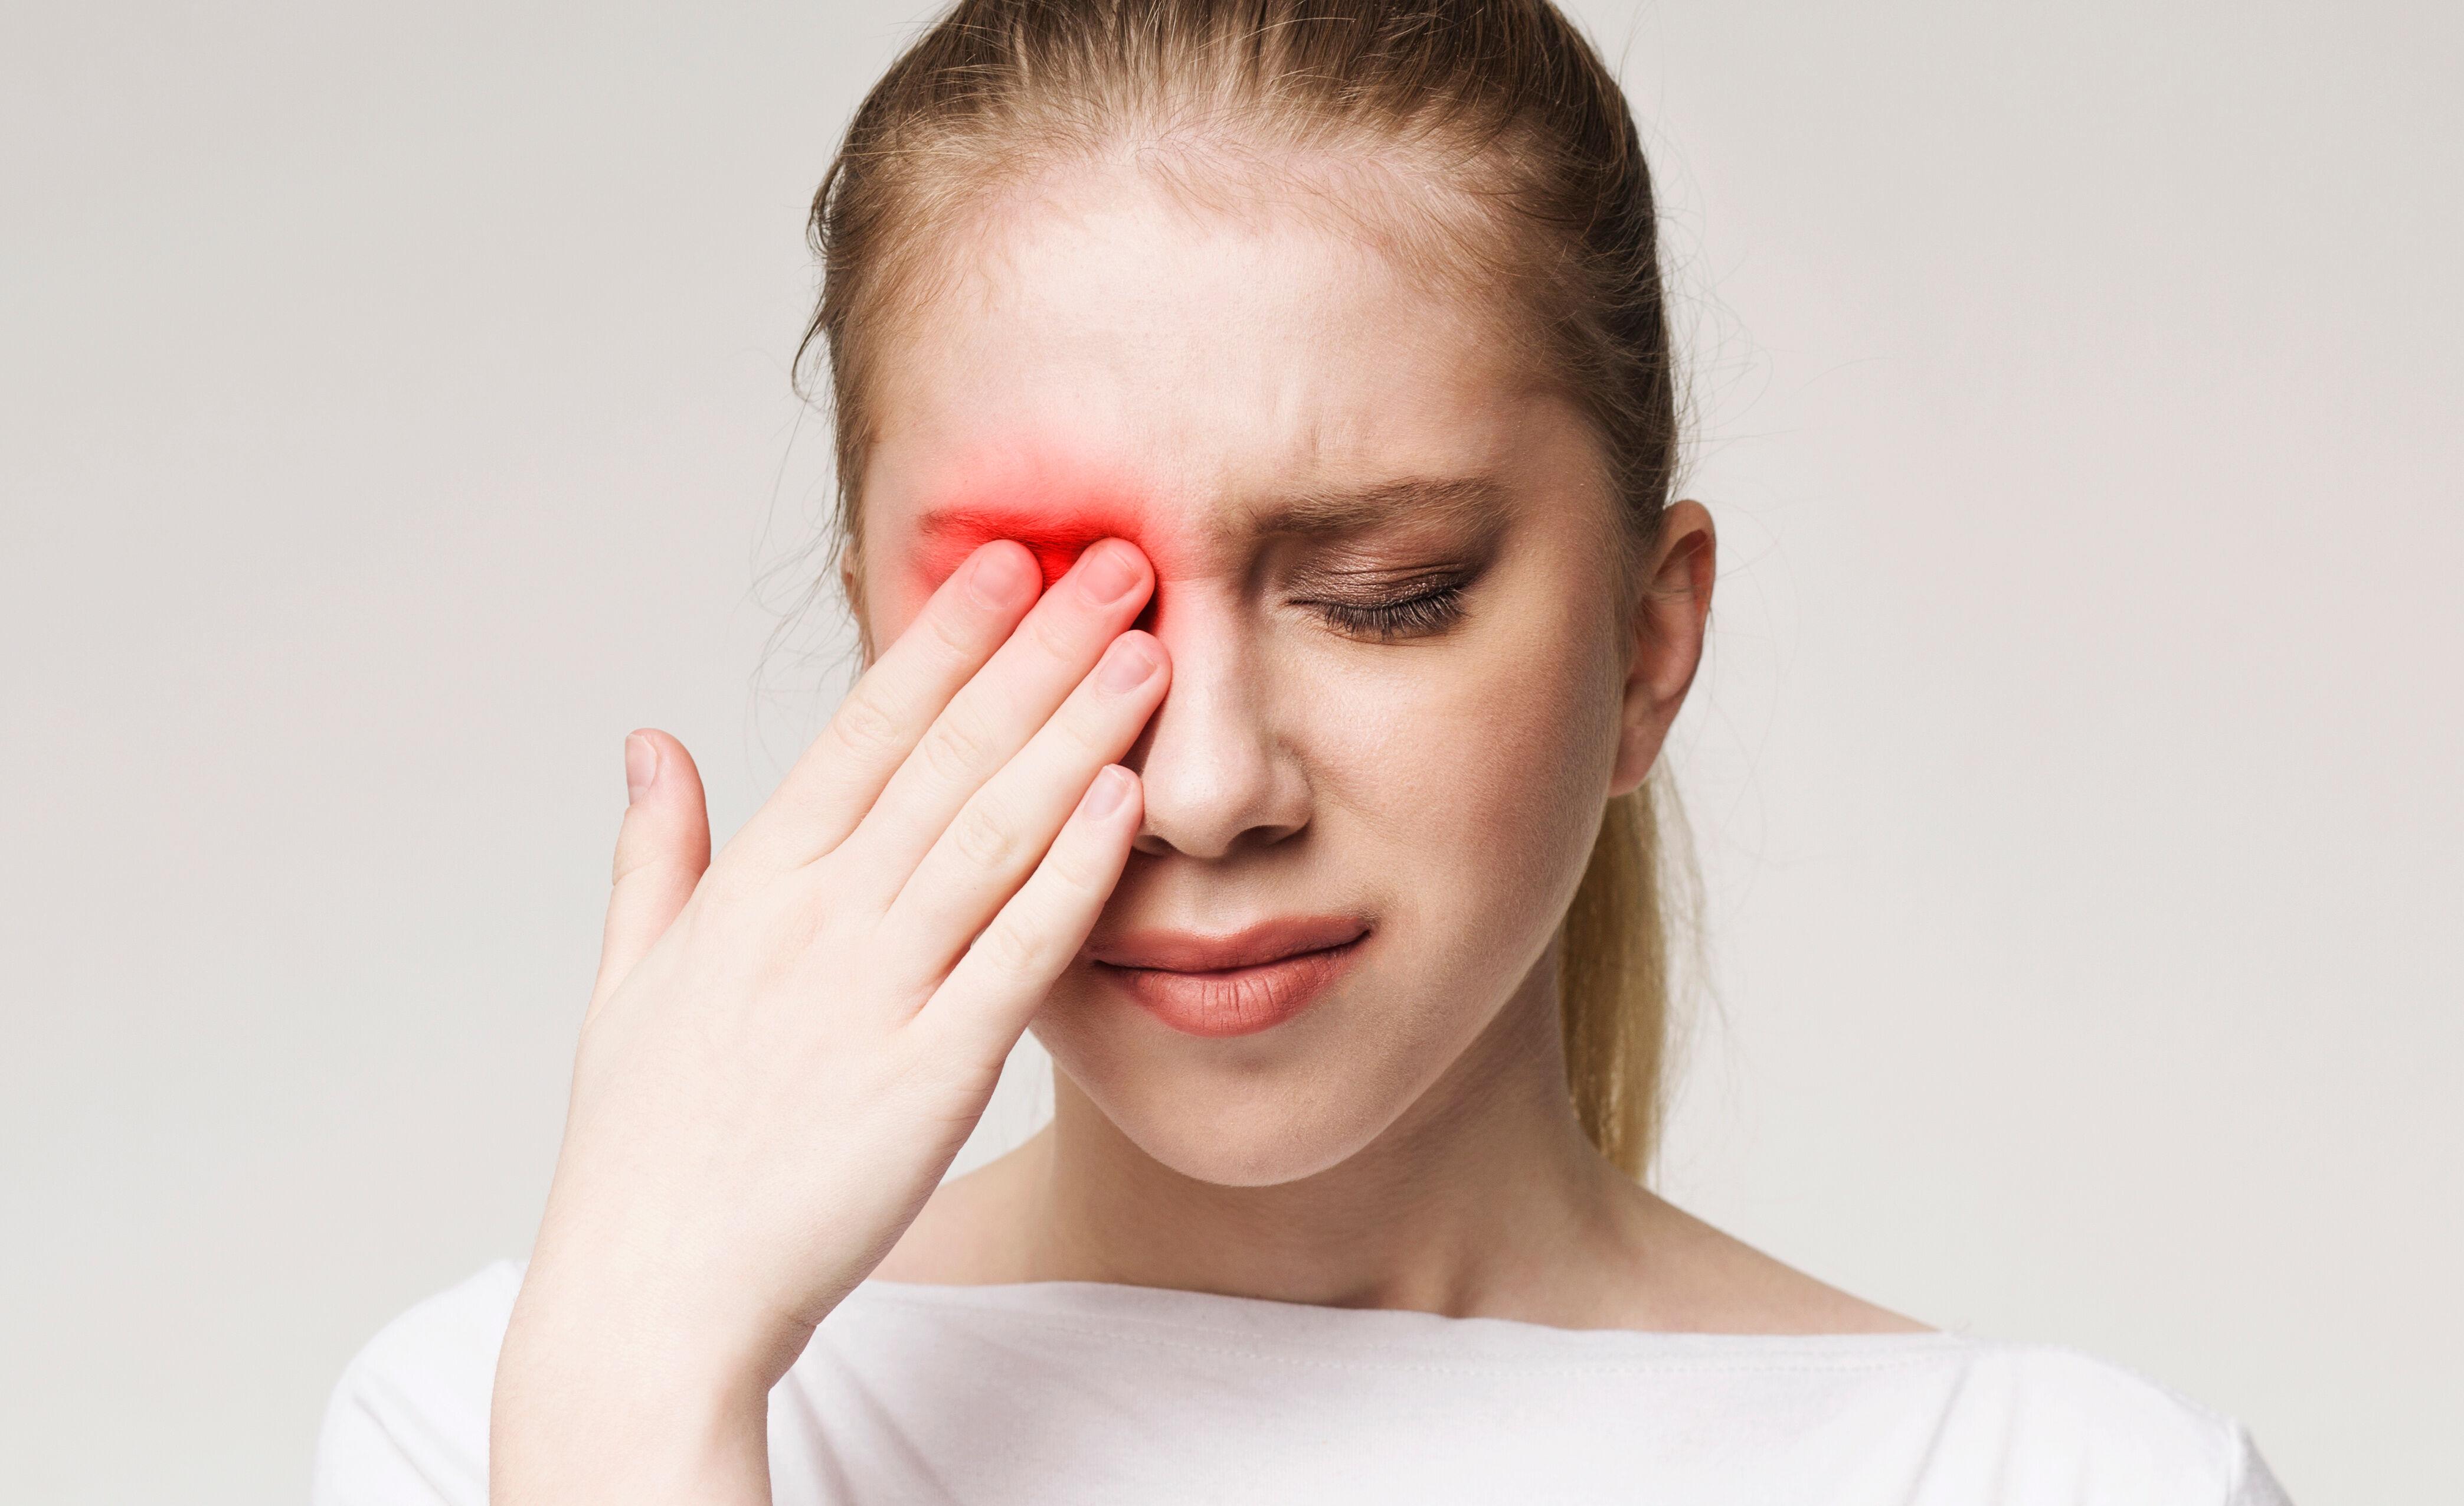 The girl eye hurts